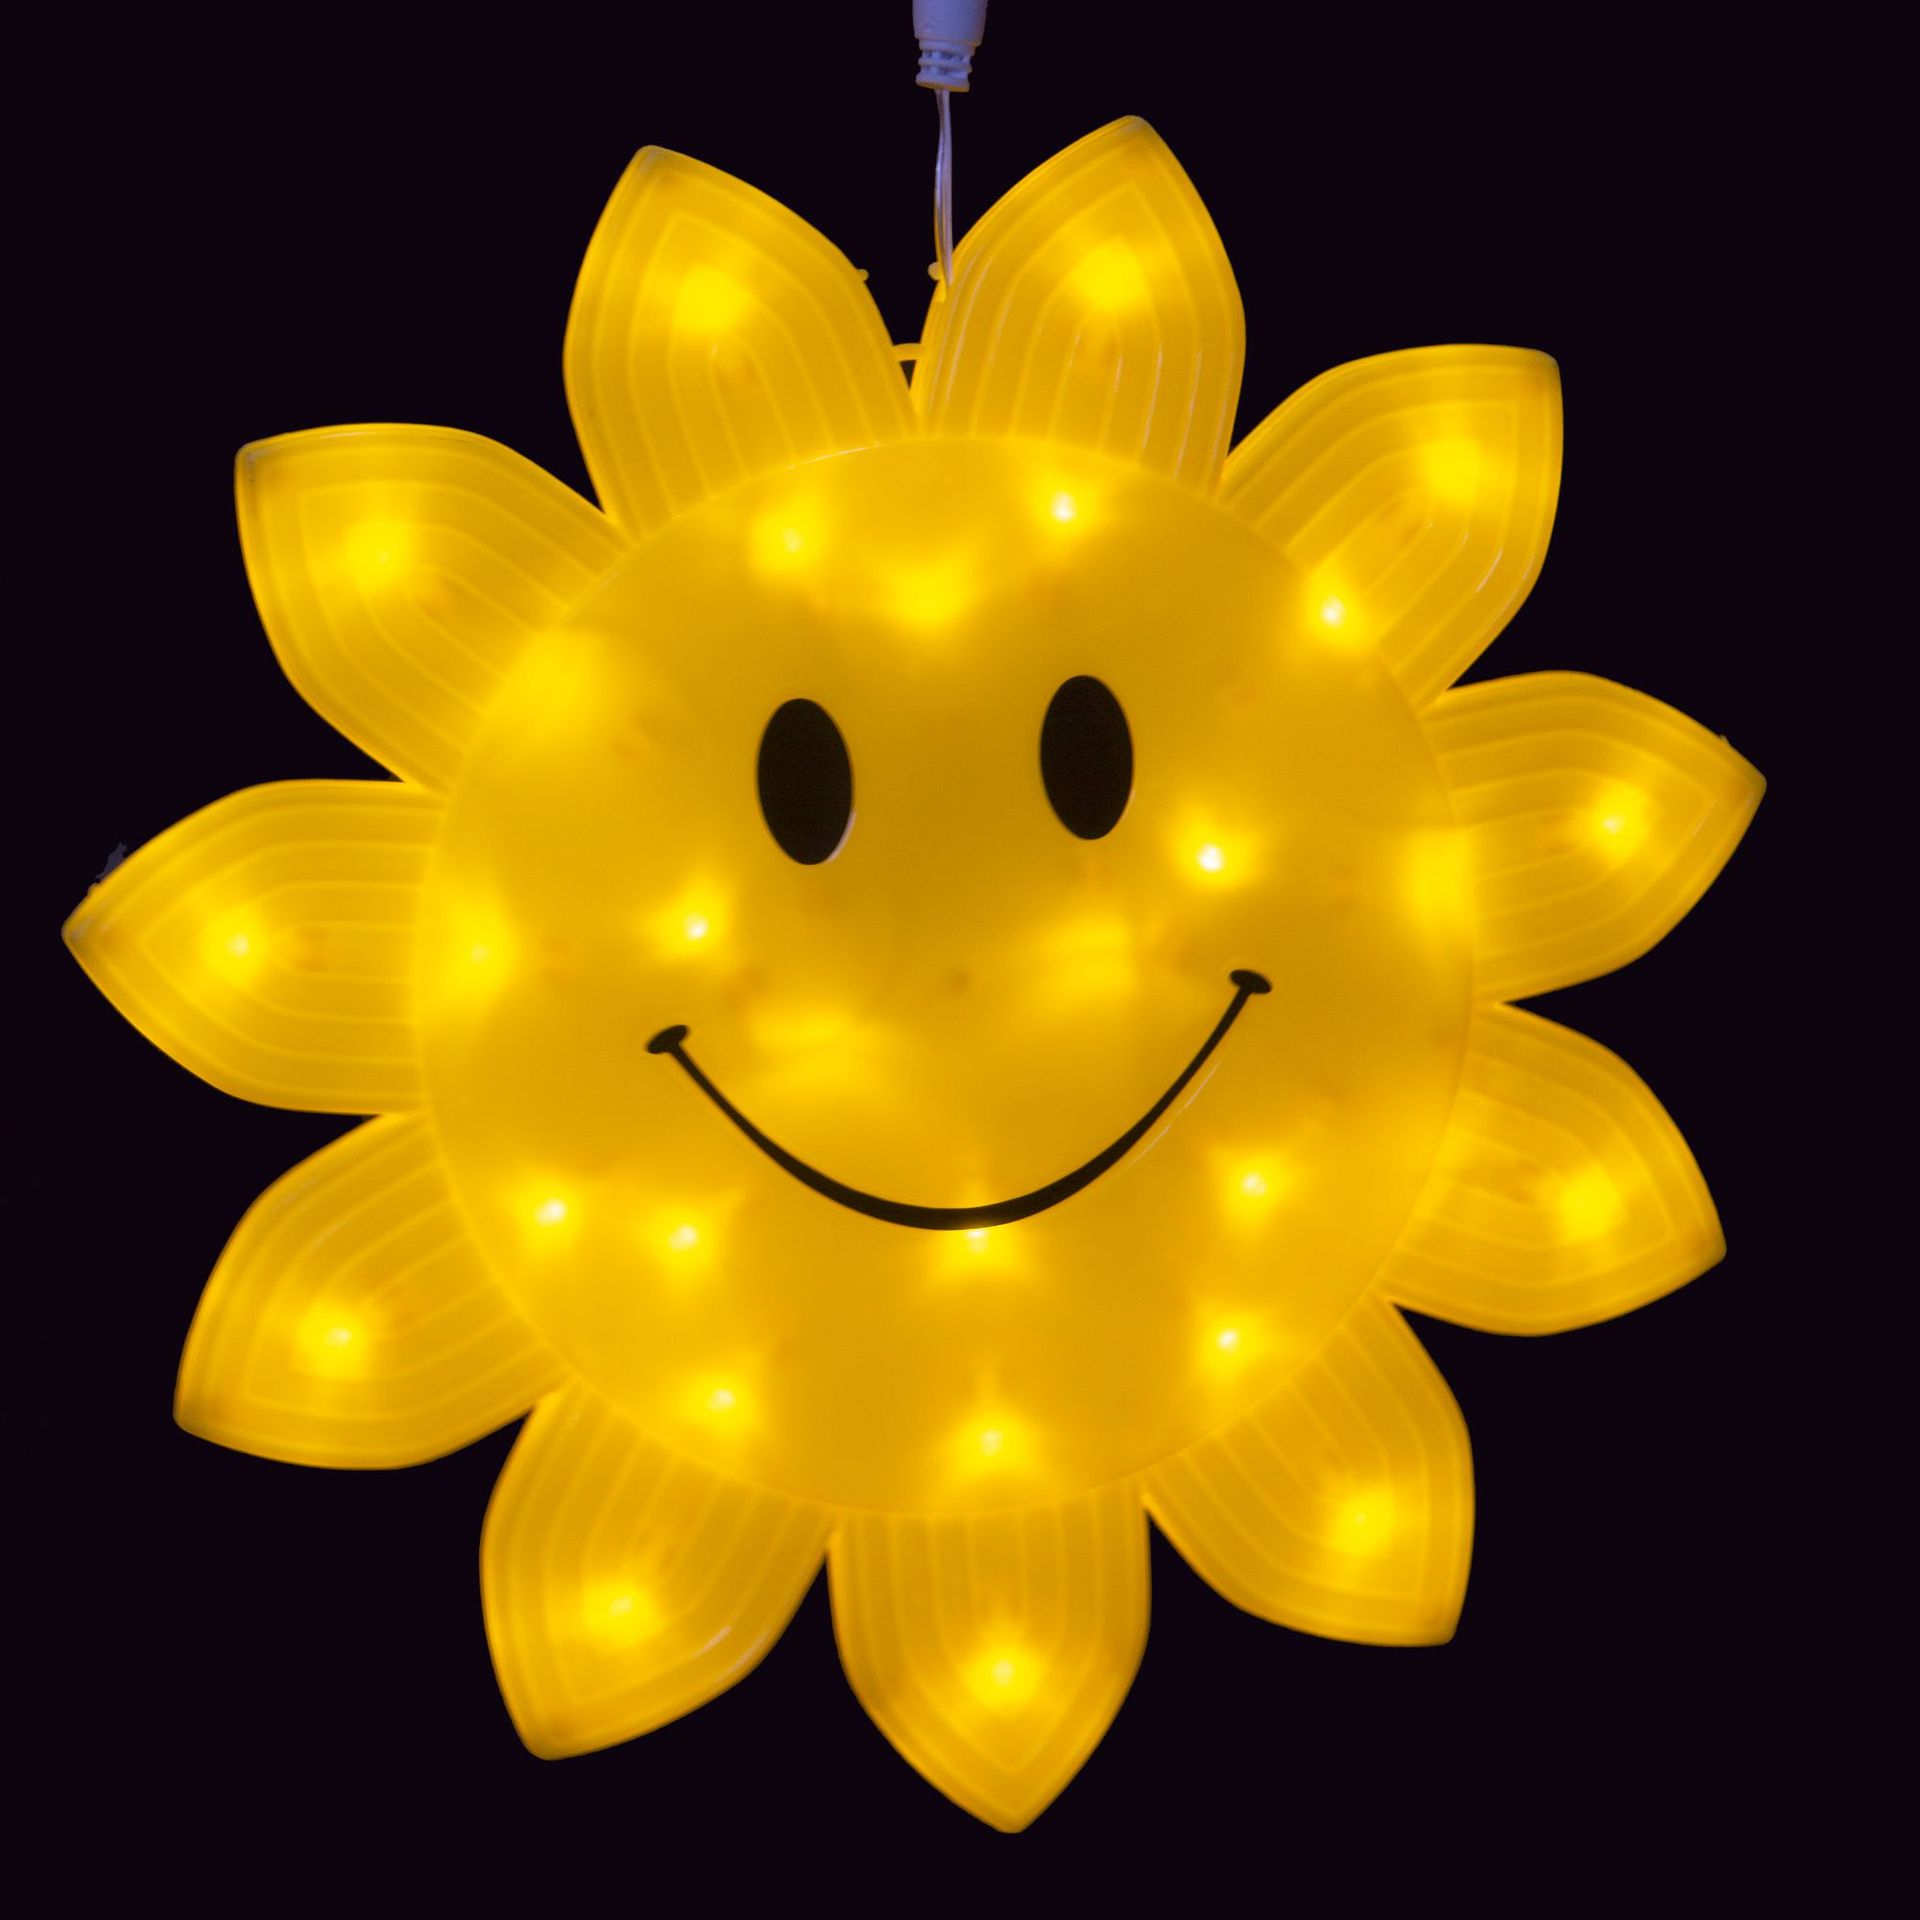 Amarelo Luz LED de Sorrindo 33 centímetros Rosto